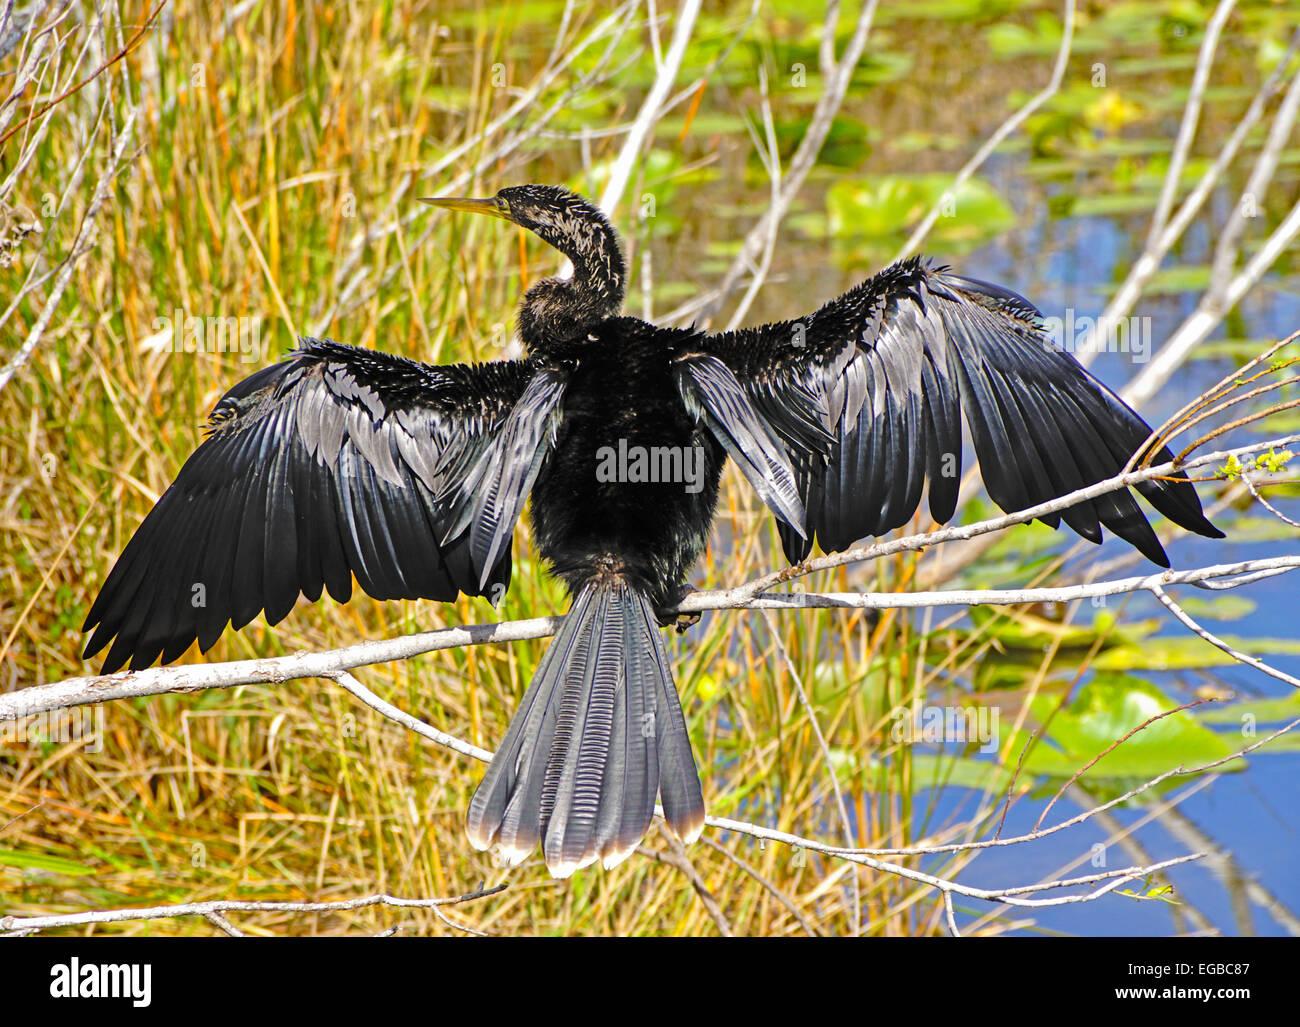 Anhinga bird on the Anhinga Trail in Everglades National Park, Florida. - Stock Image